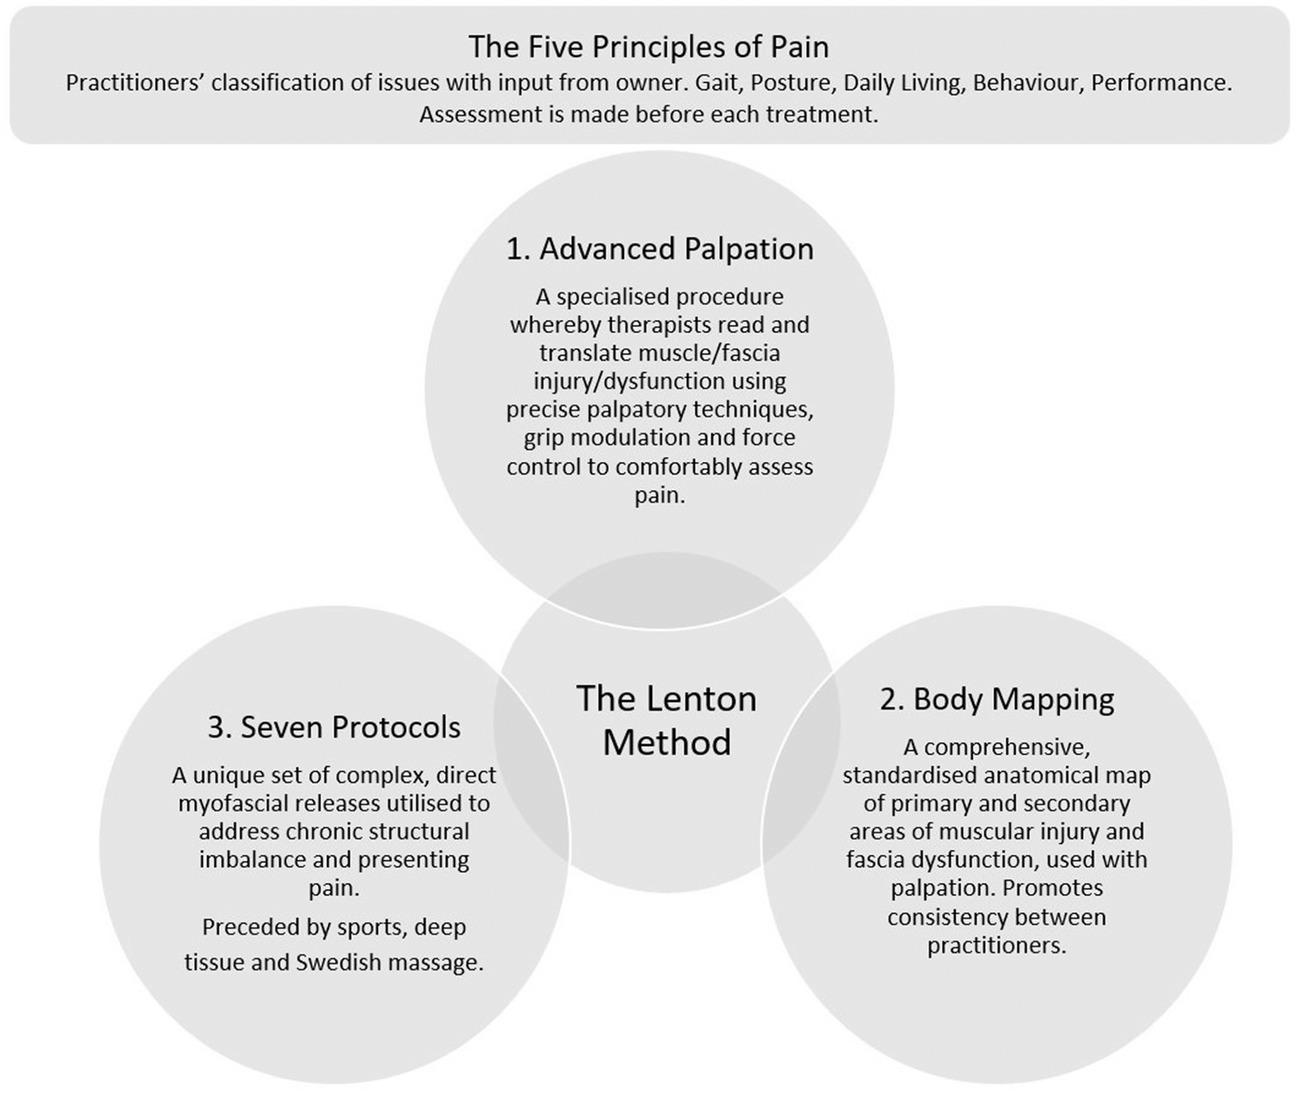 The Lenton Method